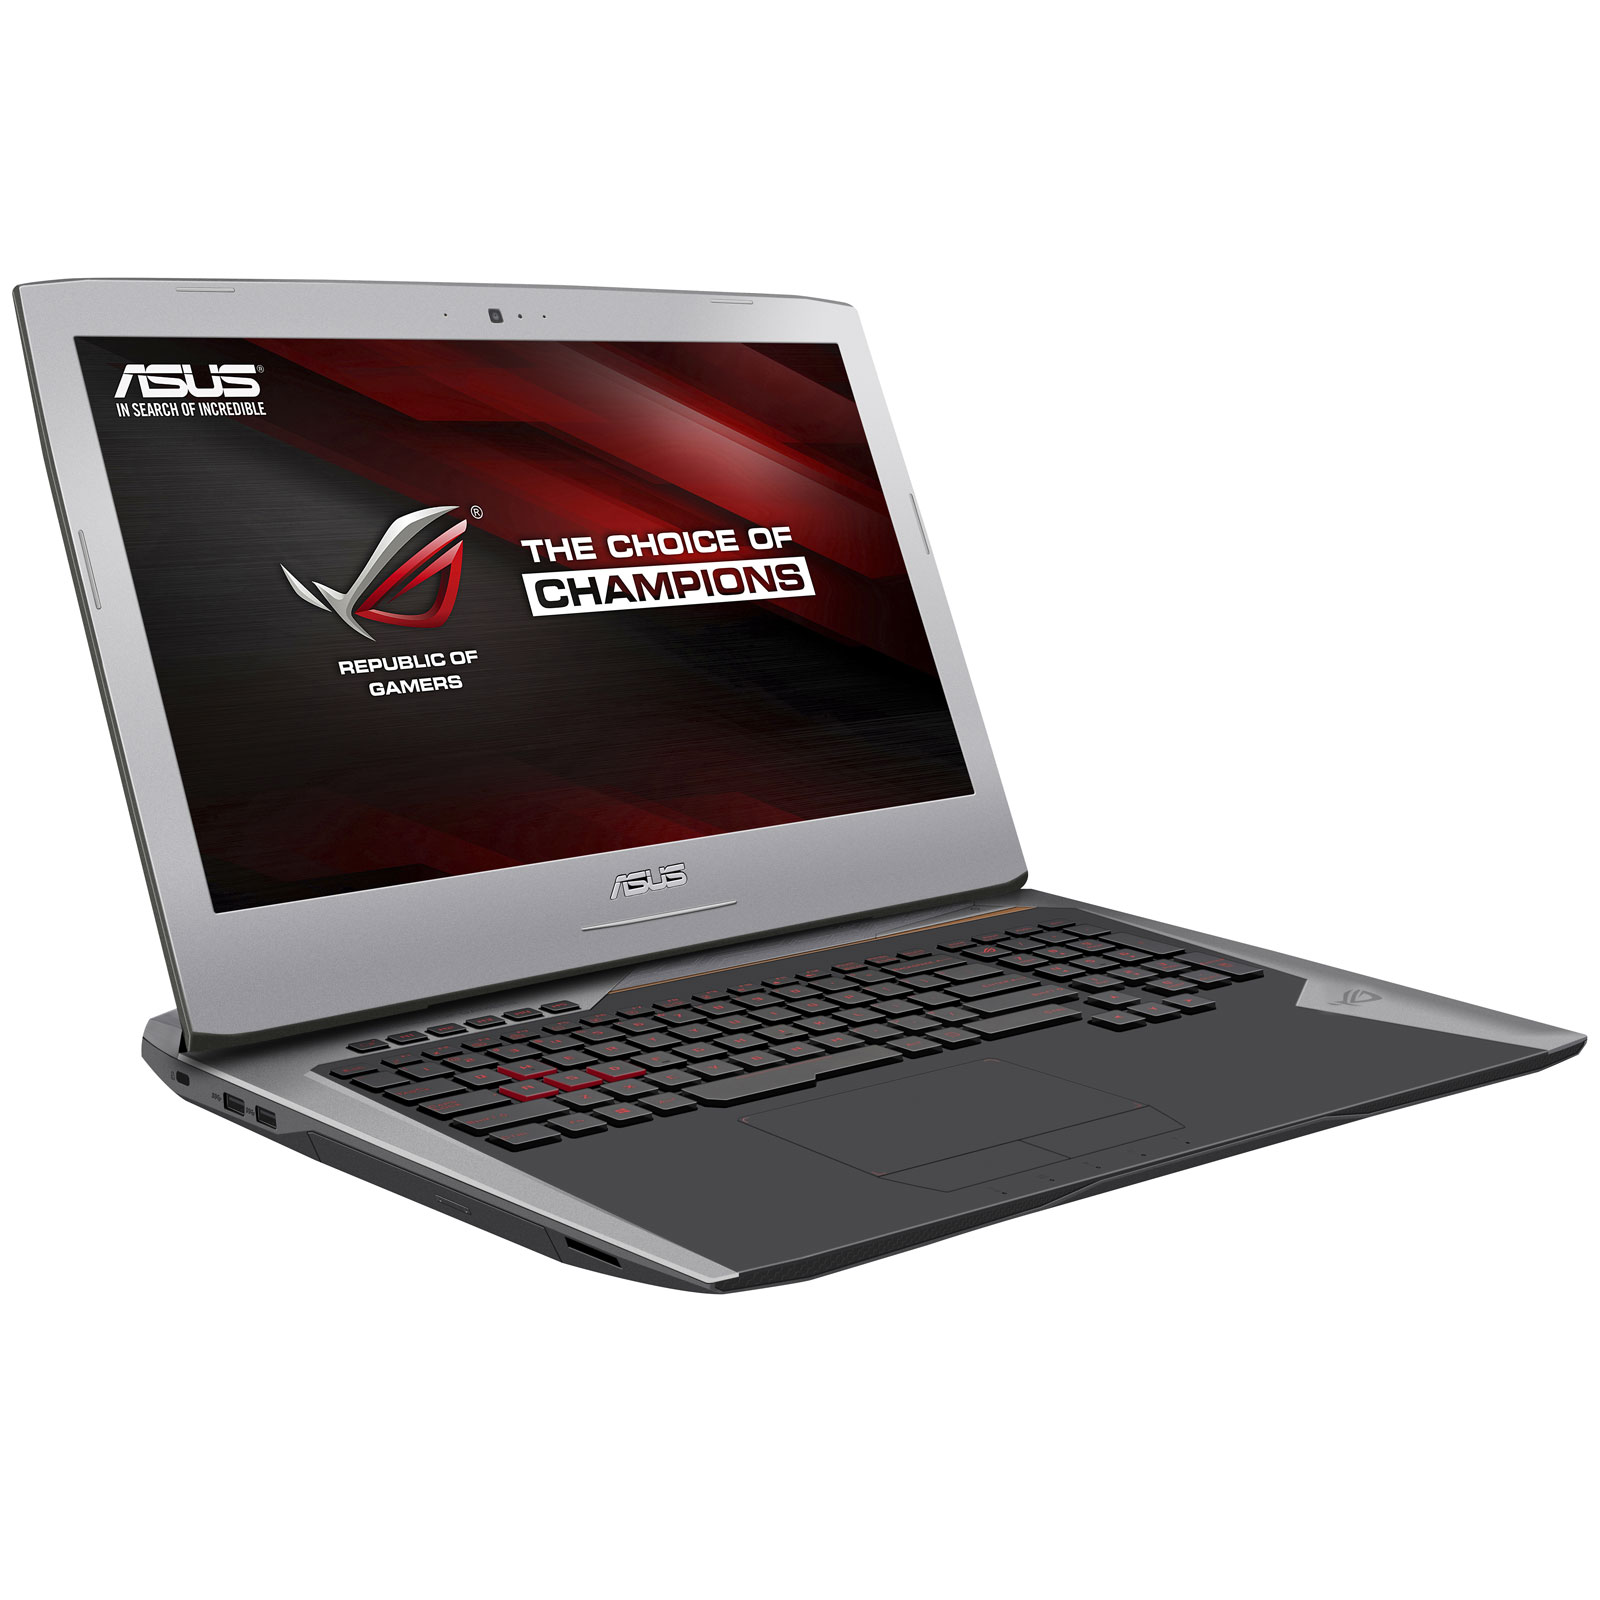 "PC portable ASUS ROG G752VS(KBL)-BA343 Intel Core i7-7700HQ 8 Go SSD 256 Go + HDD 1 To 17.3"" LED Full HD 120 Hz G-SYNC NVIDIA GeForce GTX 1070 8 Go Graveur DVD Wi-Fi AC/Bluetooth Webcam Endless OS (garantie constructeur 2 ans)"